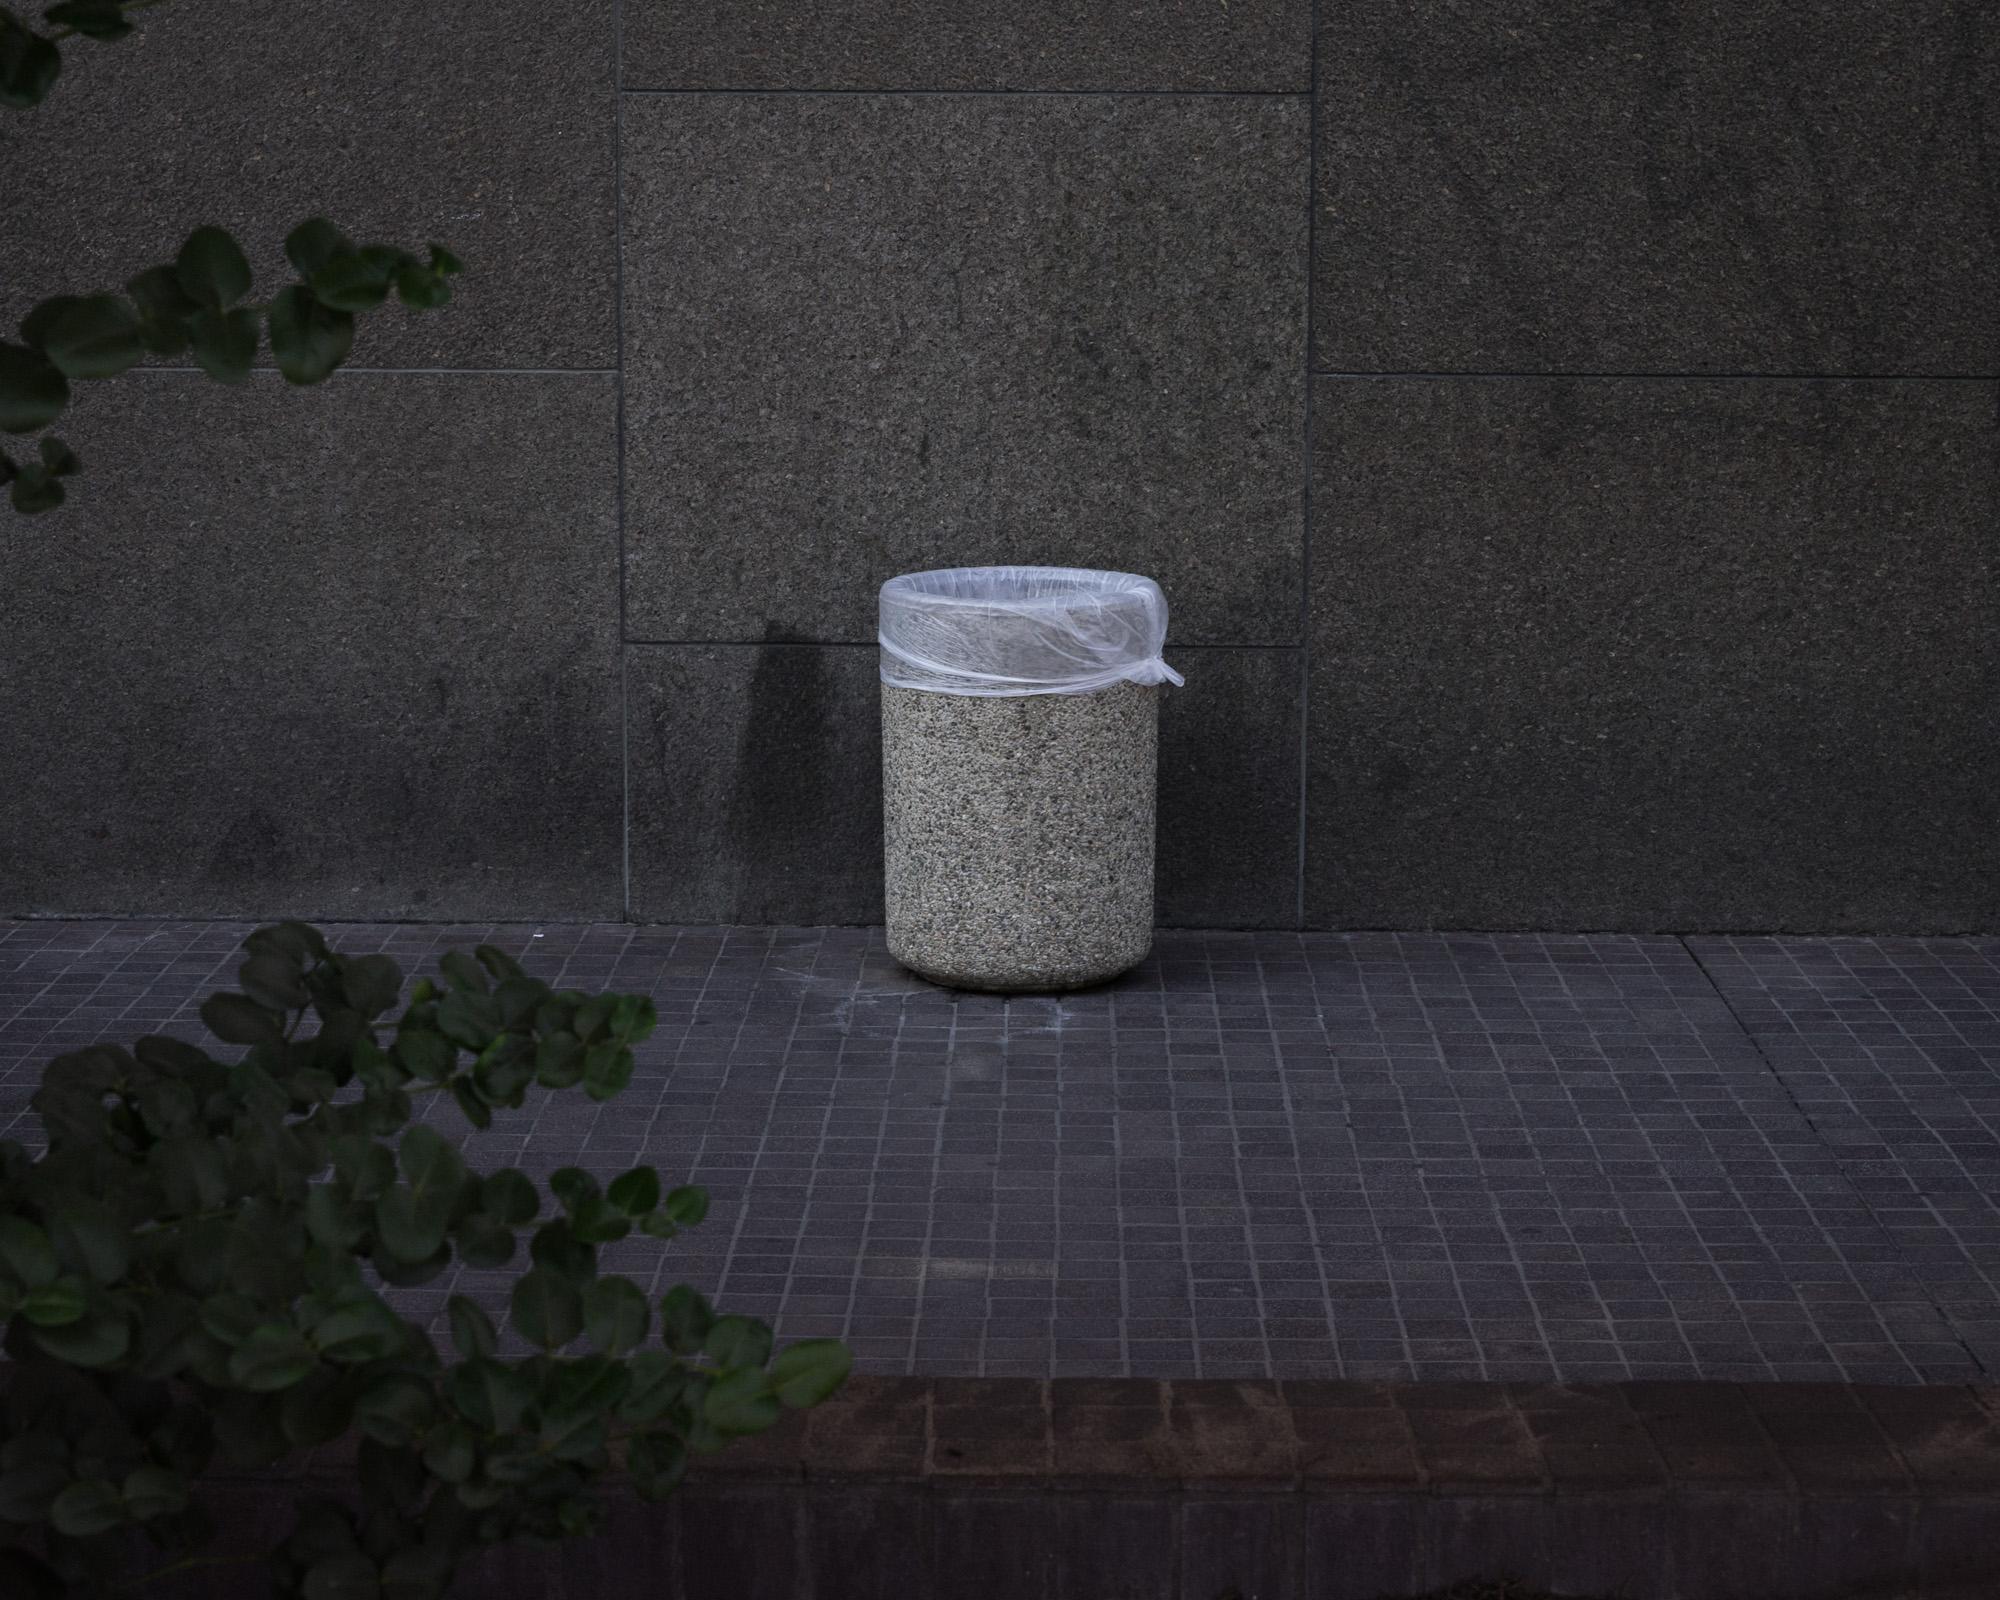 Untitled, 2017